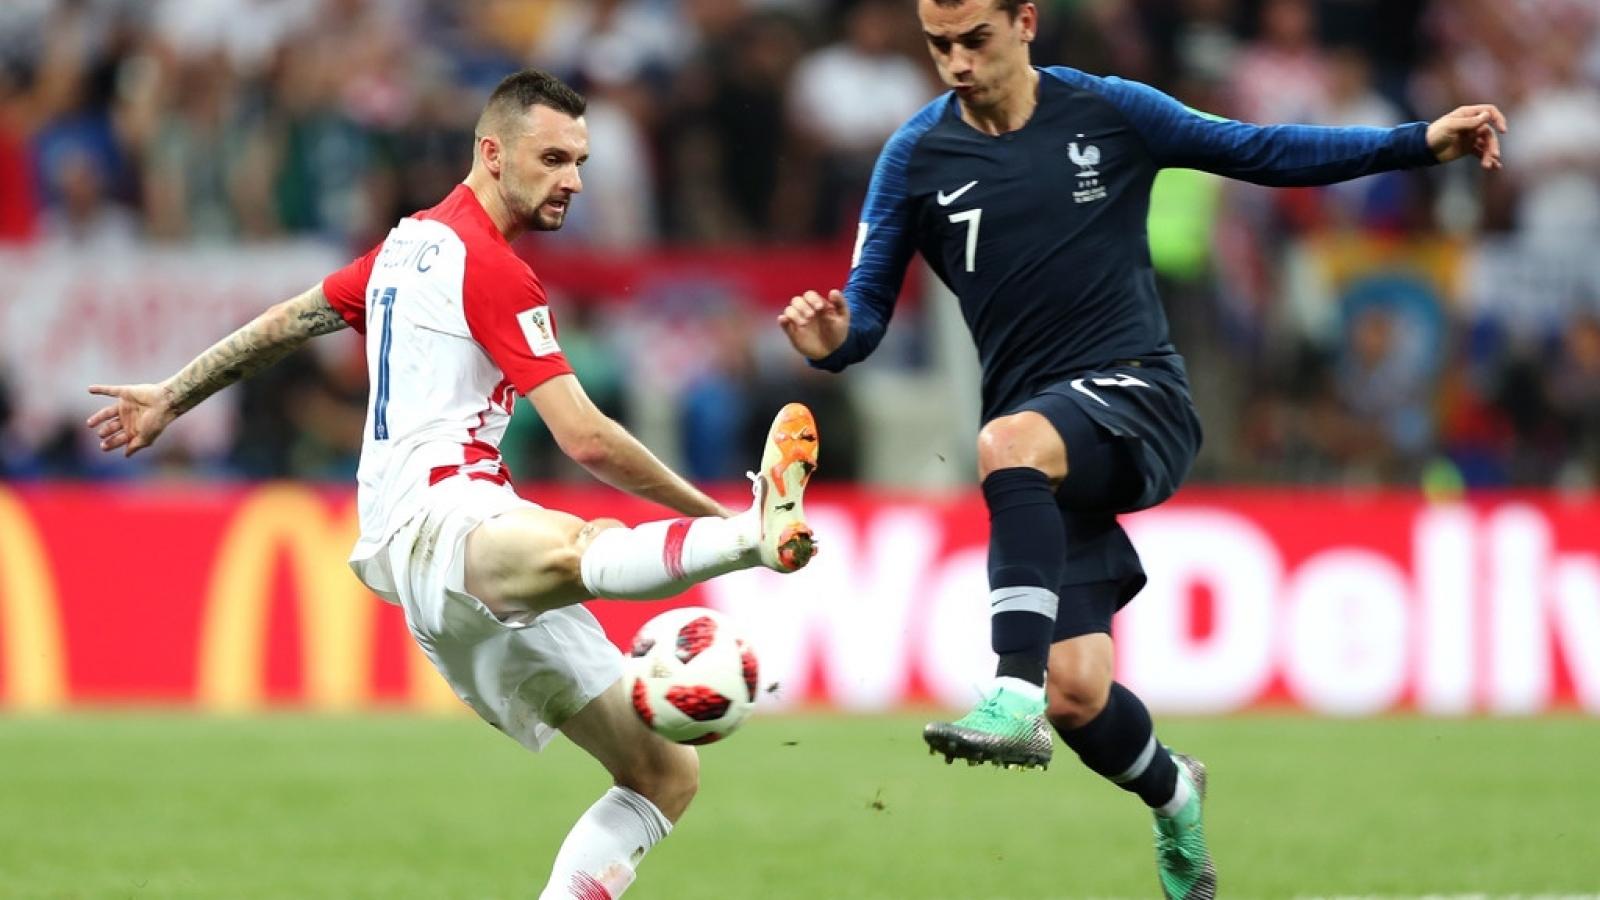 Pháp - Croatia: Tái hiện trận chung kết World Cup 2018